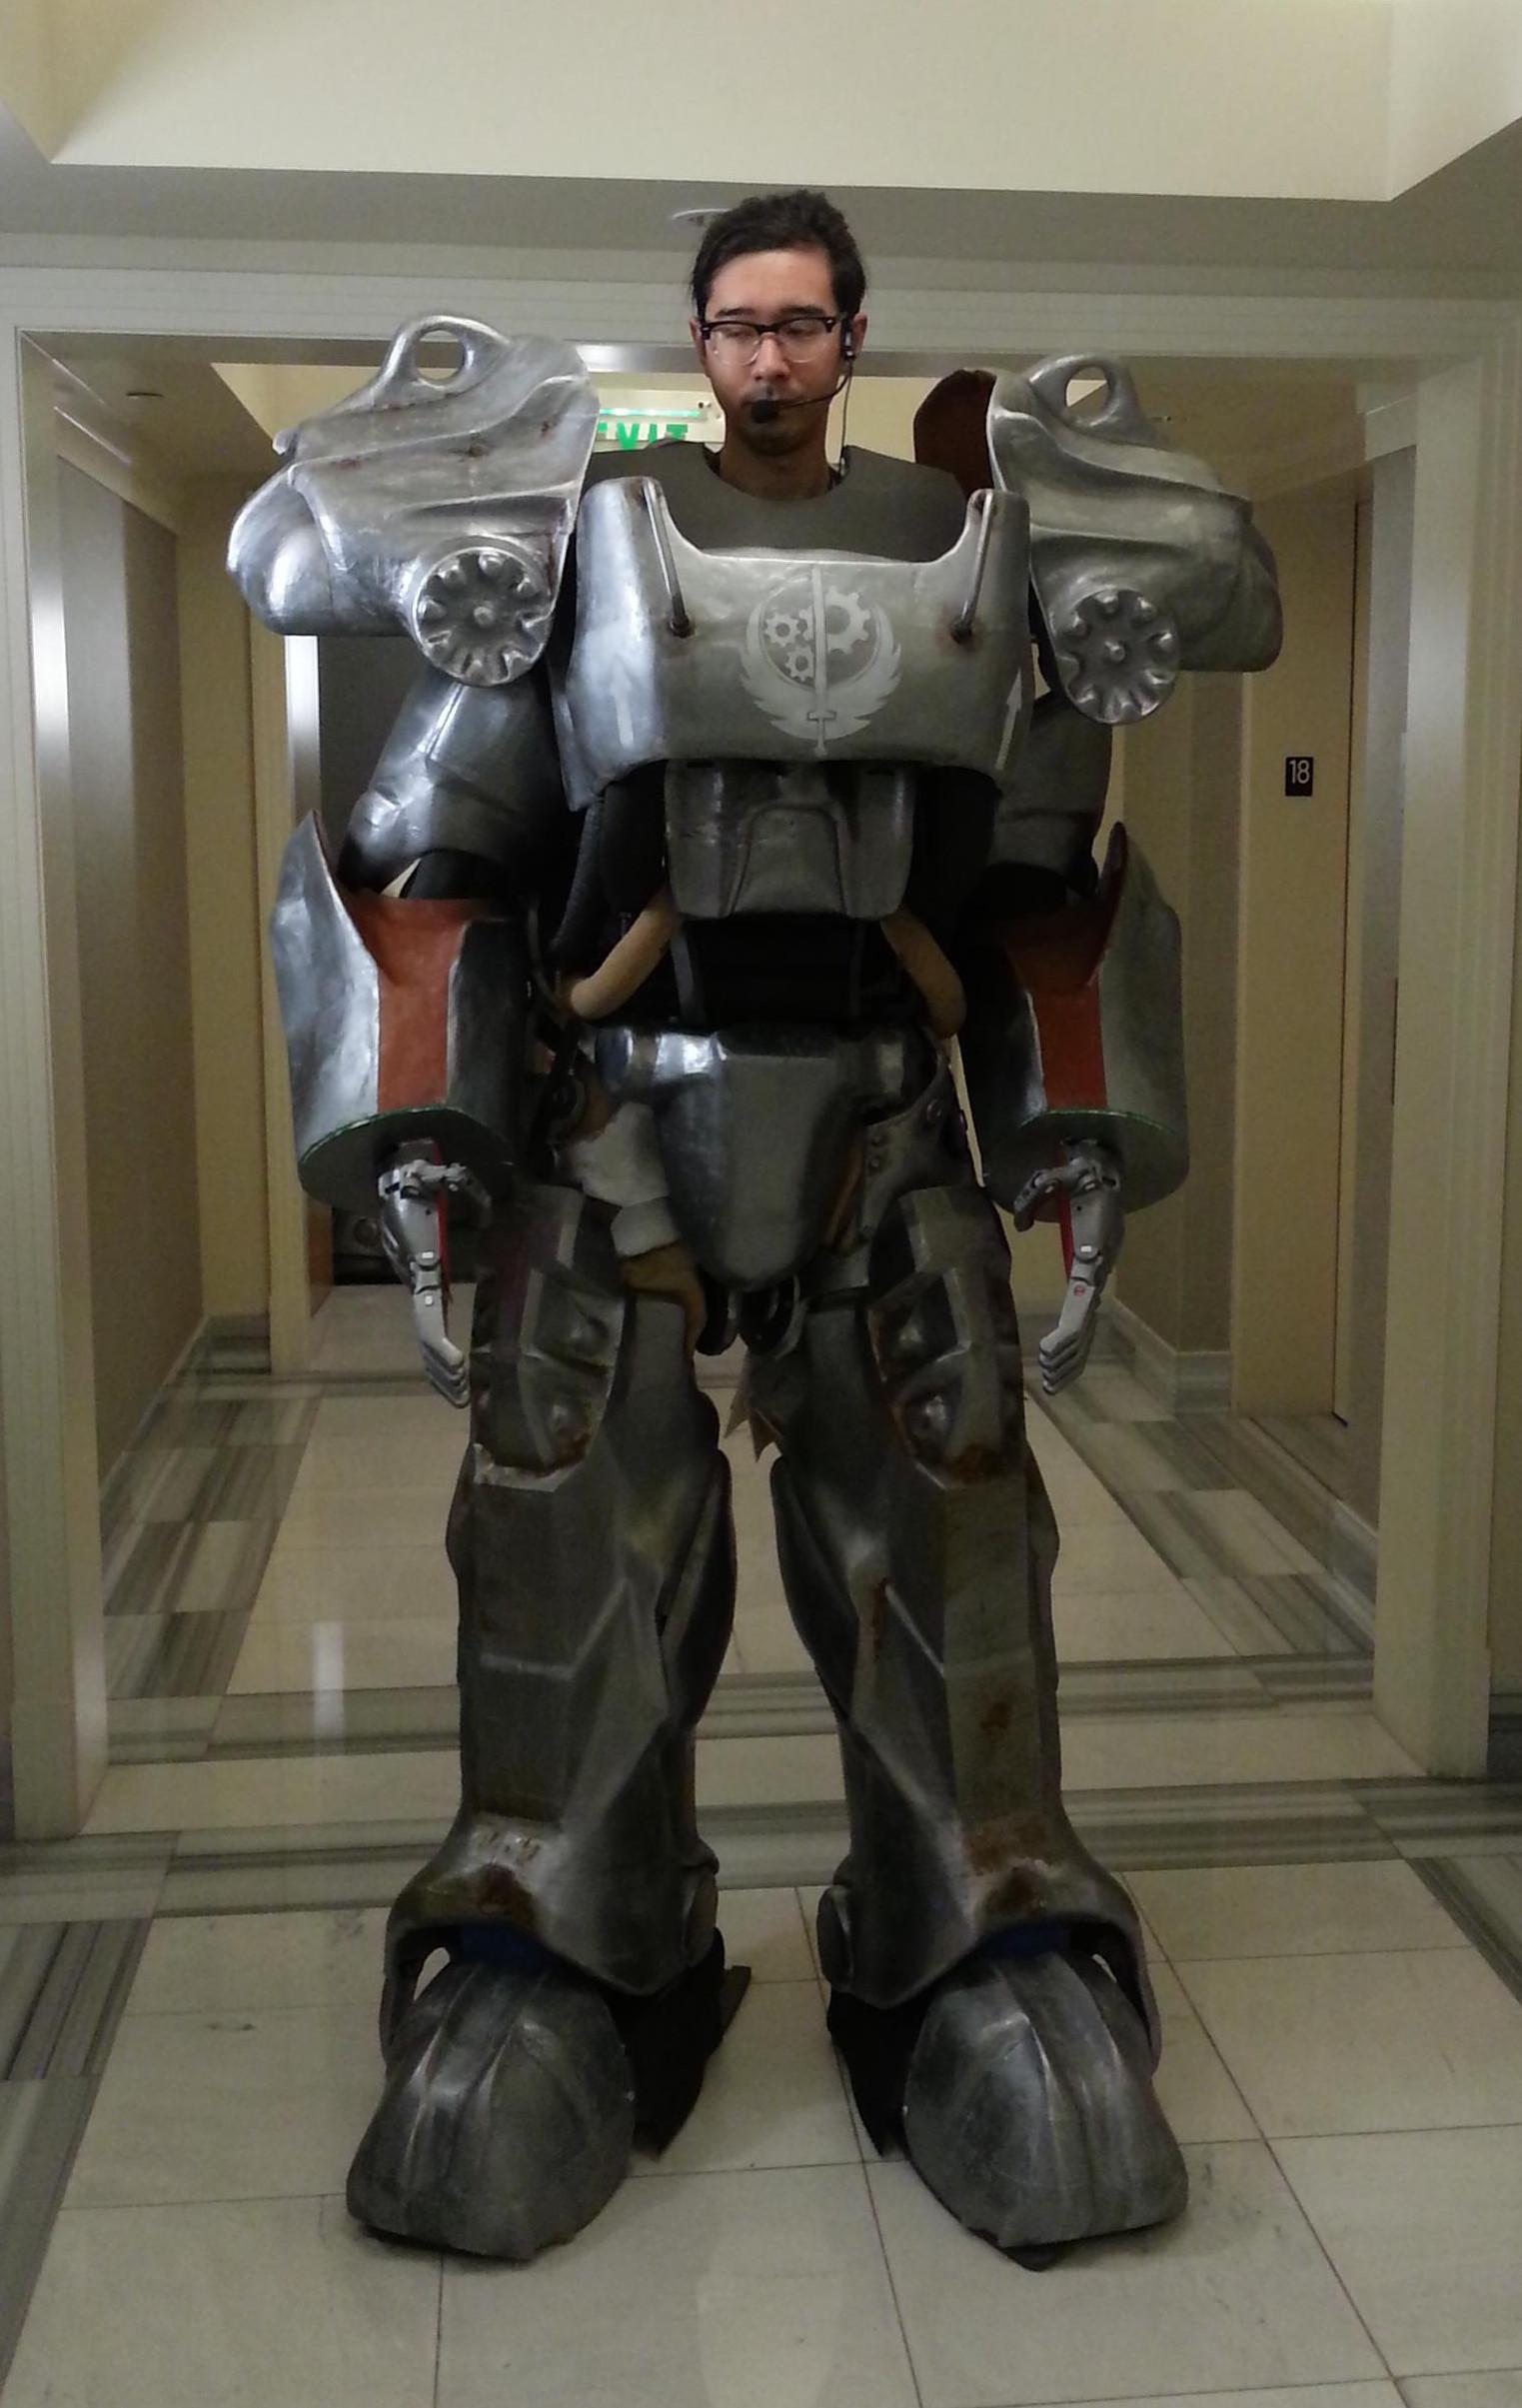 monstrous suit of power